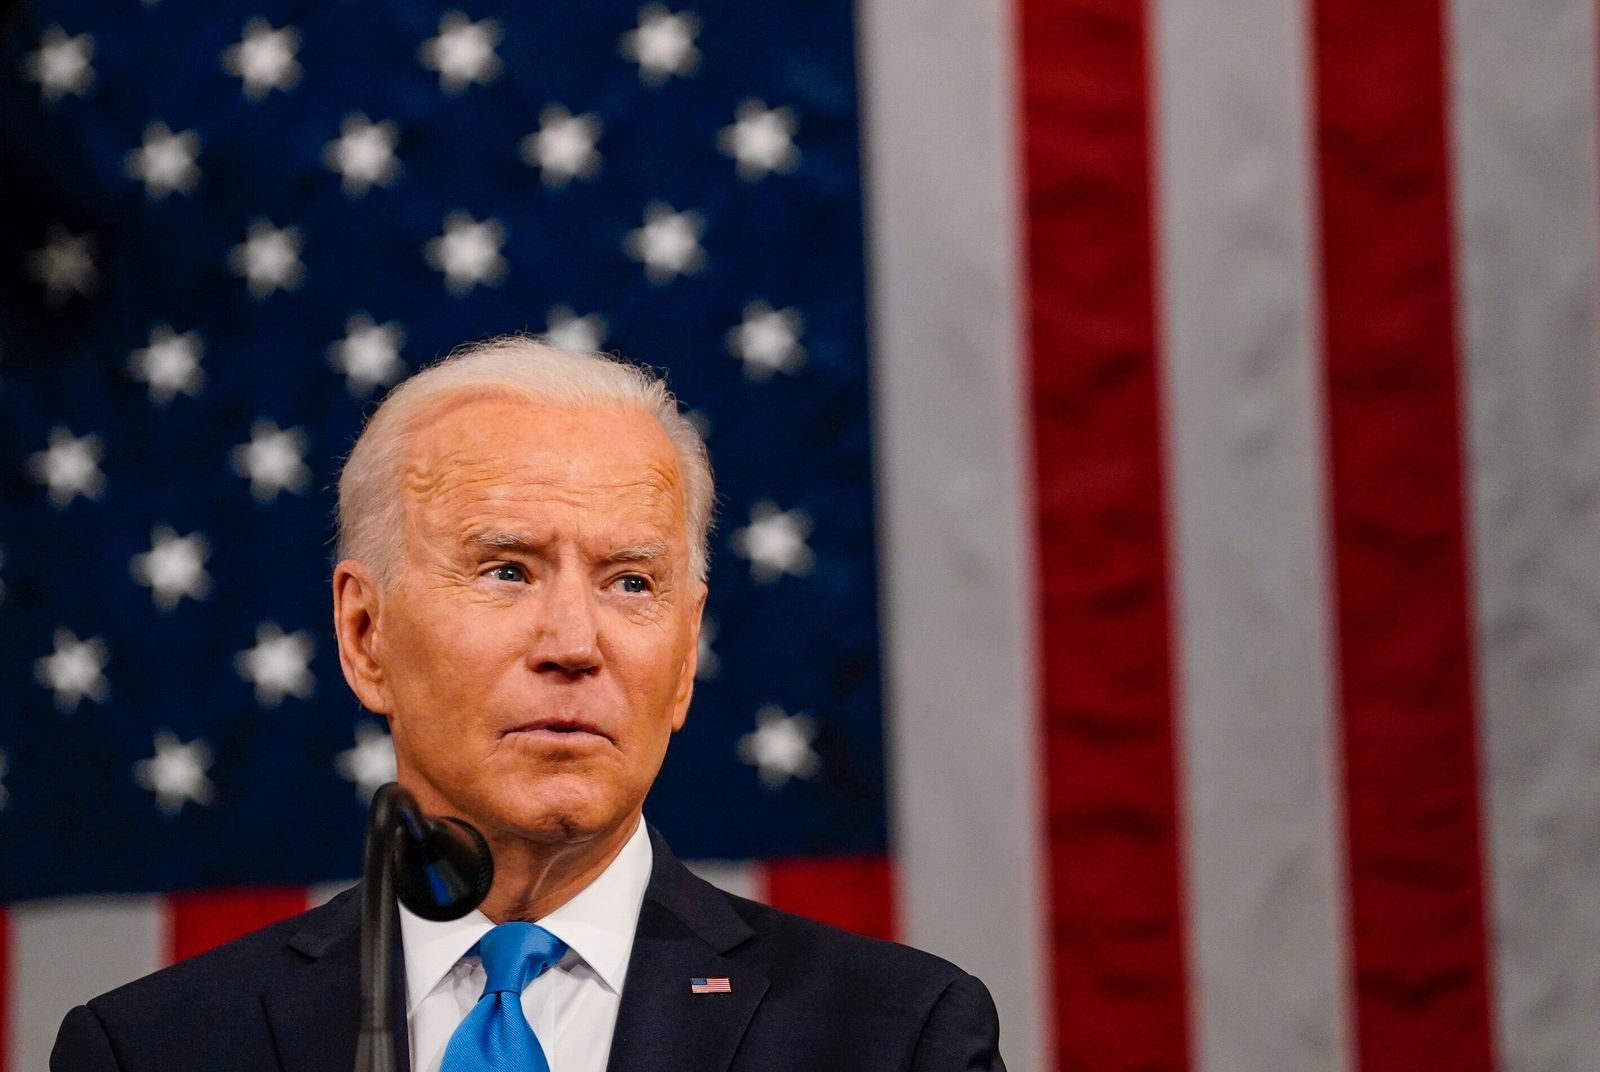 April 28, 2021, Washington, District of Columbia, USA: WASHINGTON, DC - APRIL 28: President Joe Biden addresses a joint